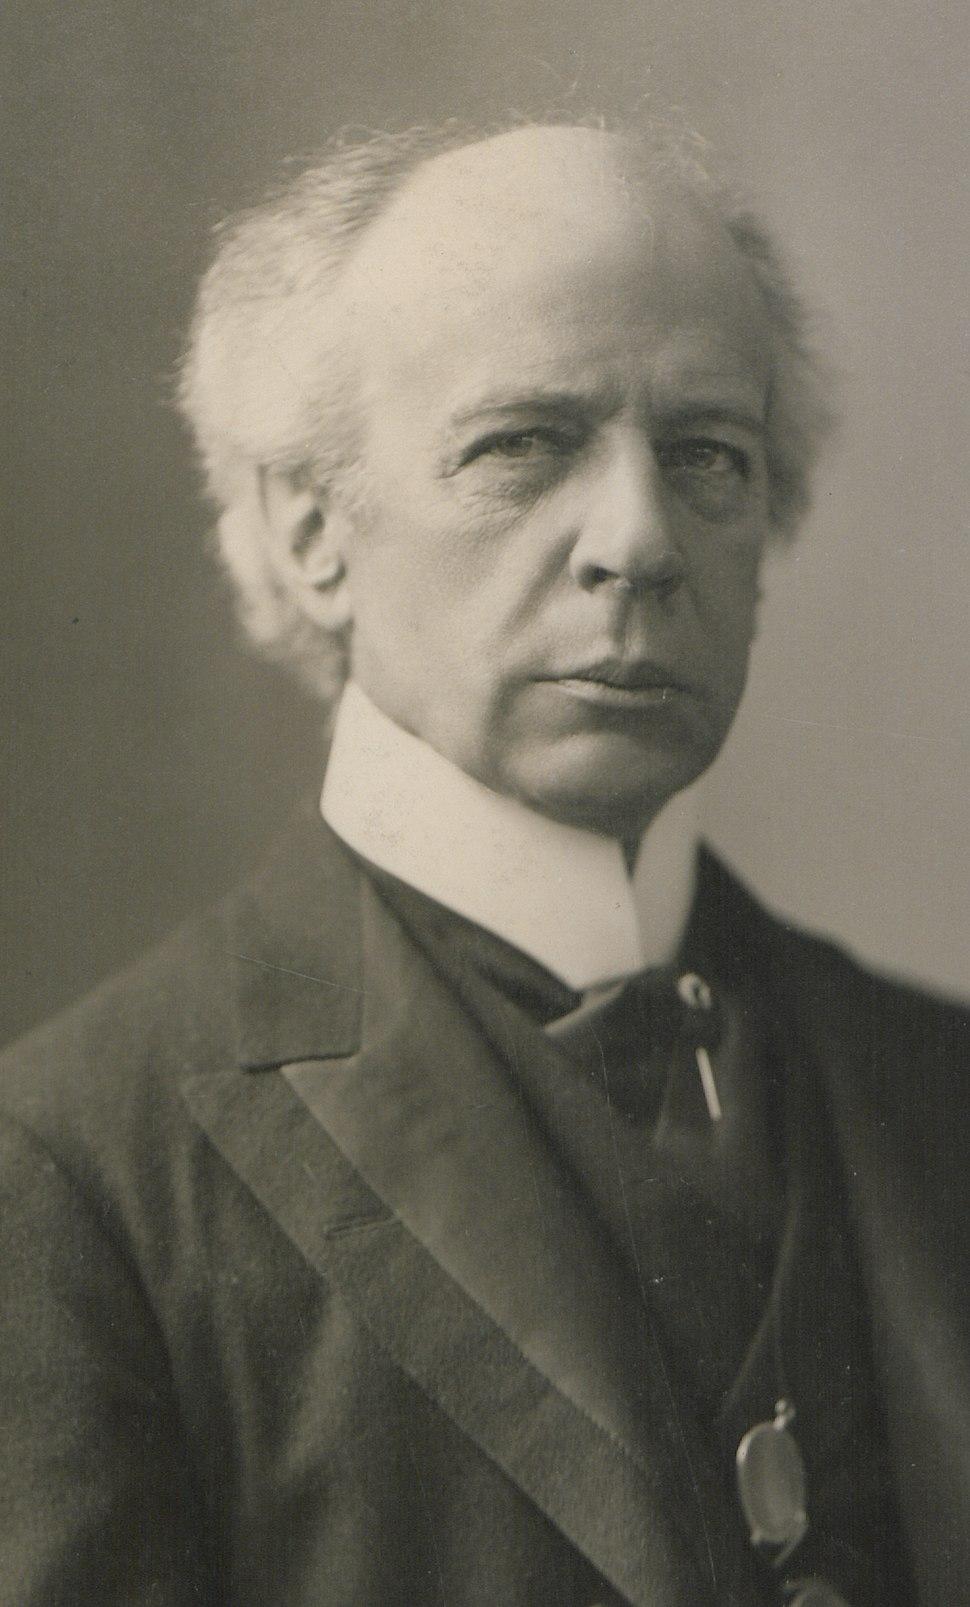 The Honourable Sir Wilfrid Laurier Photo A (HS85-10-16871) - tight crop